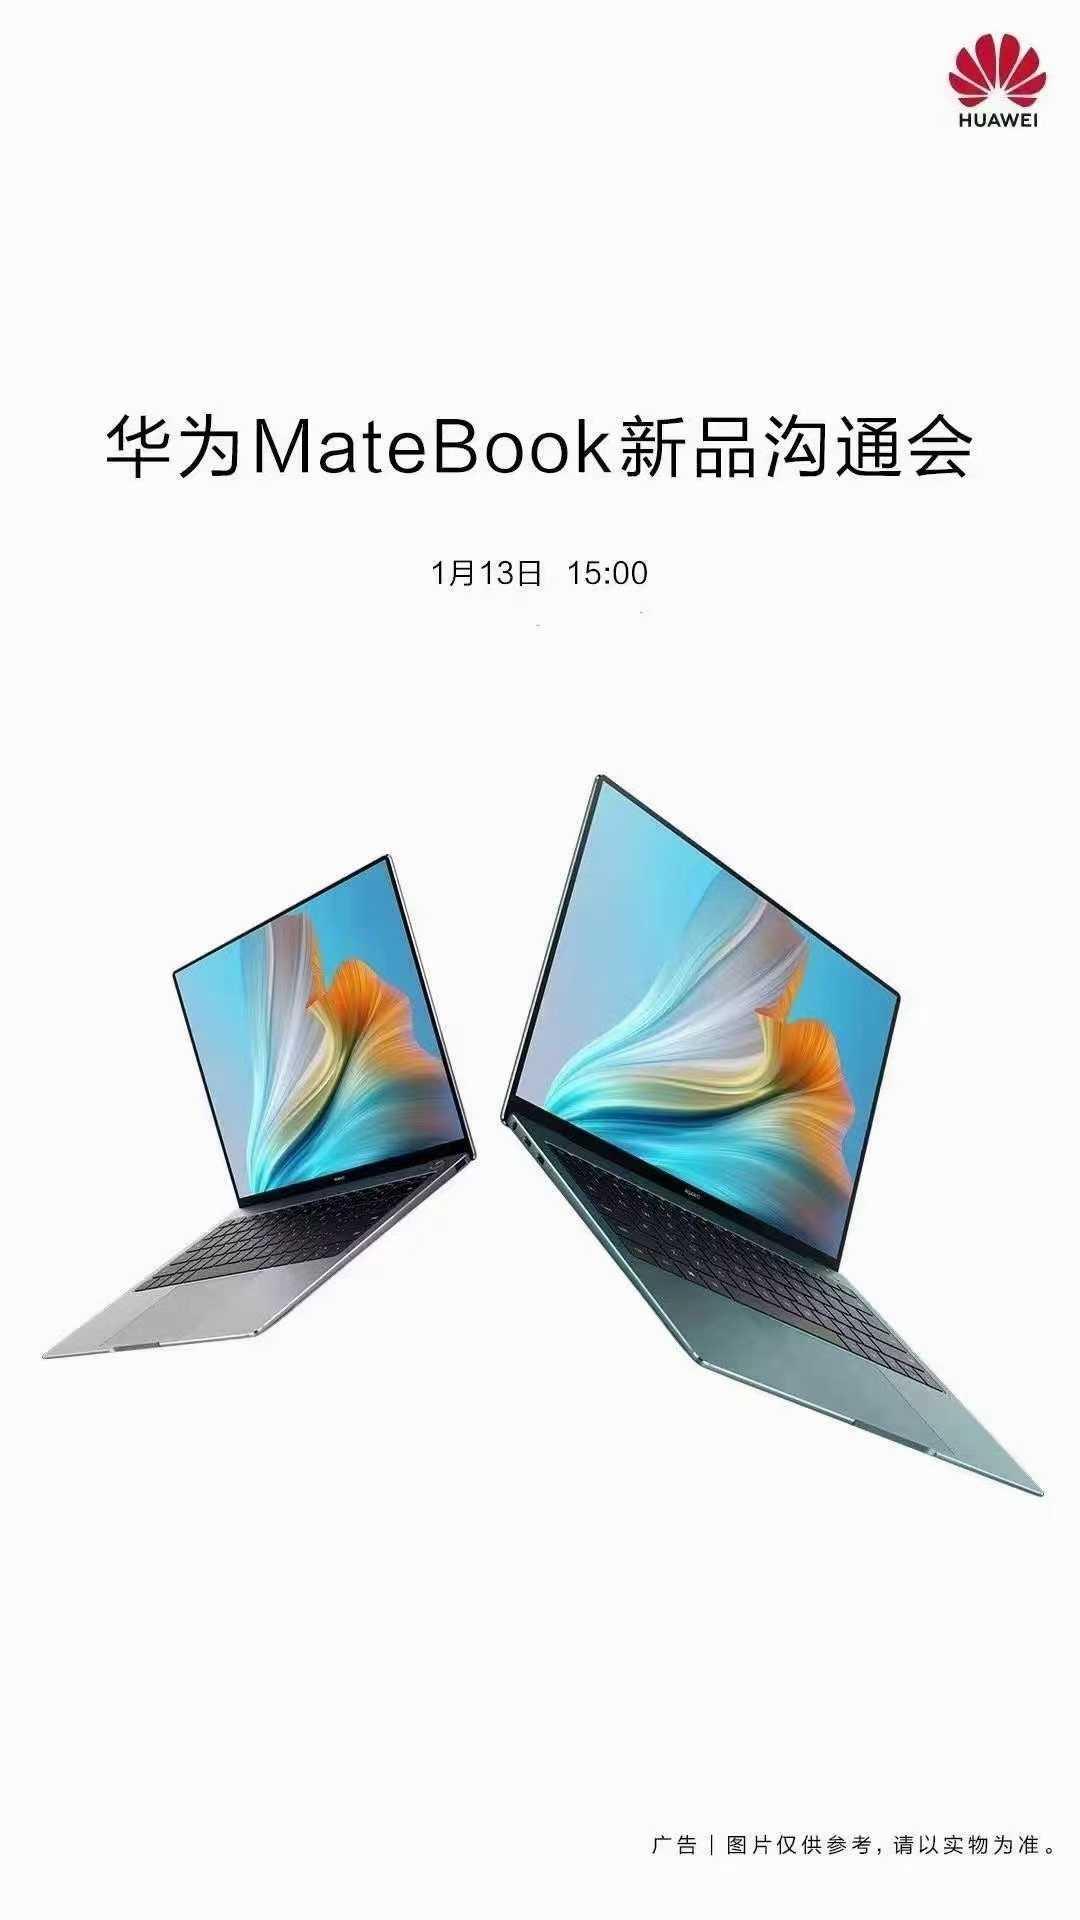 Huawei MateBook X и X Pro 2021 выйдут 13 января